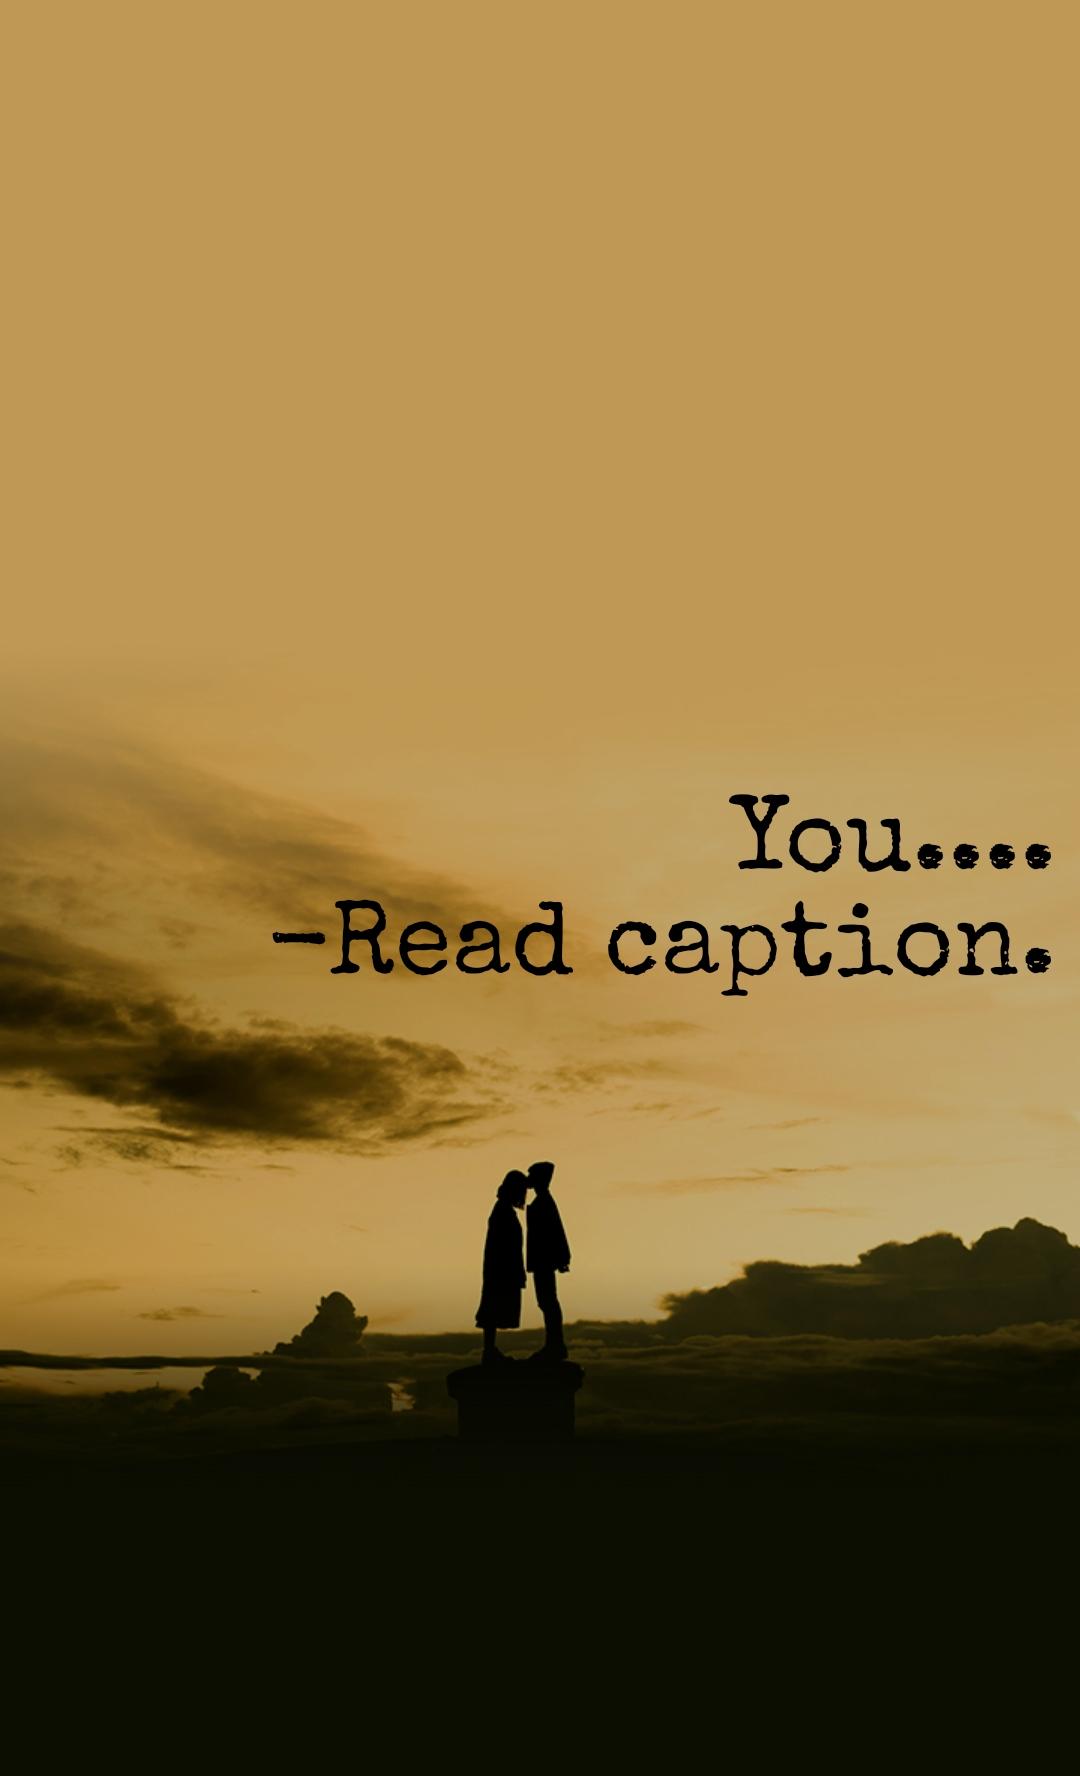 You.... -Read caption.